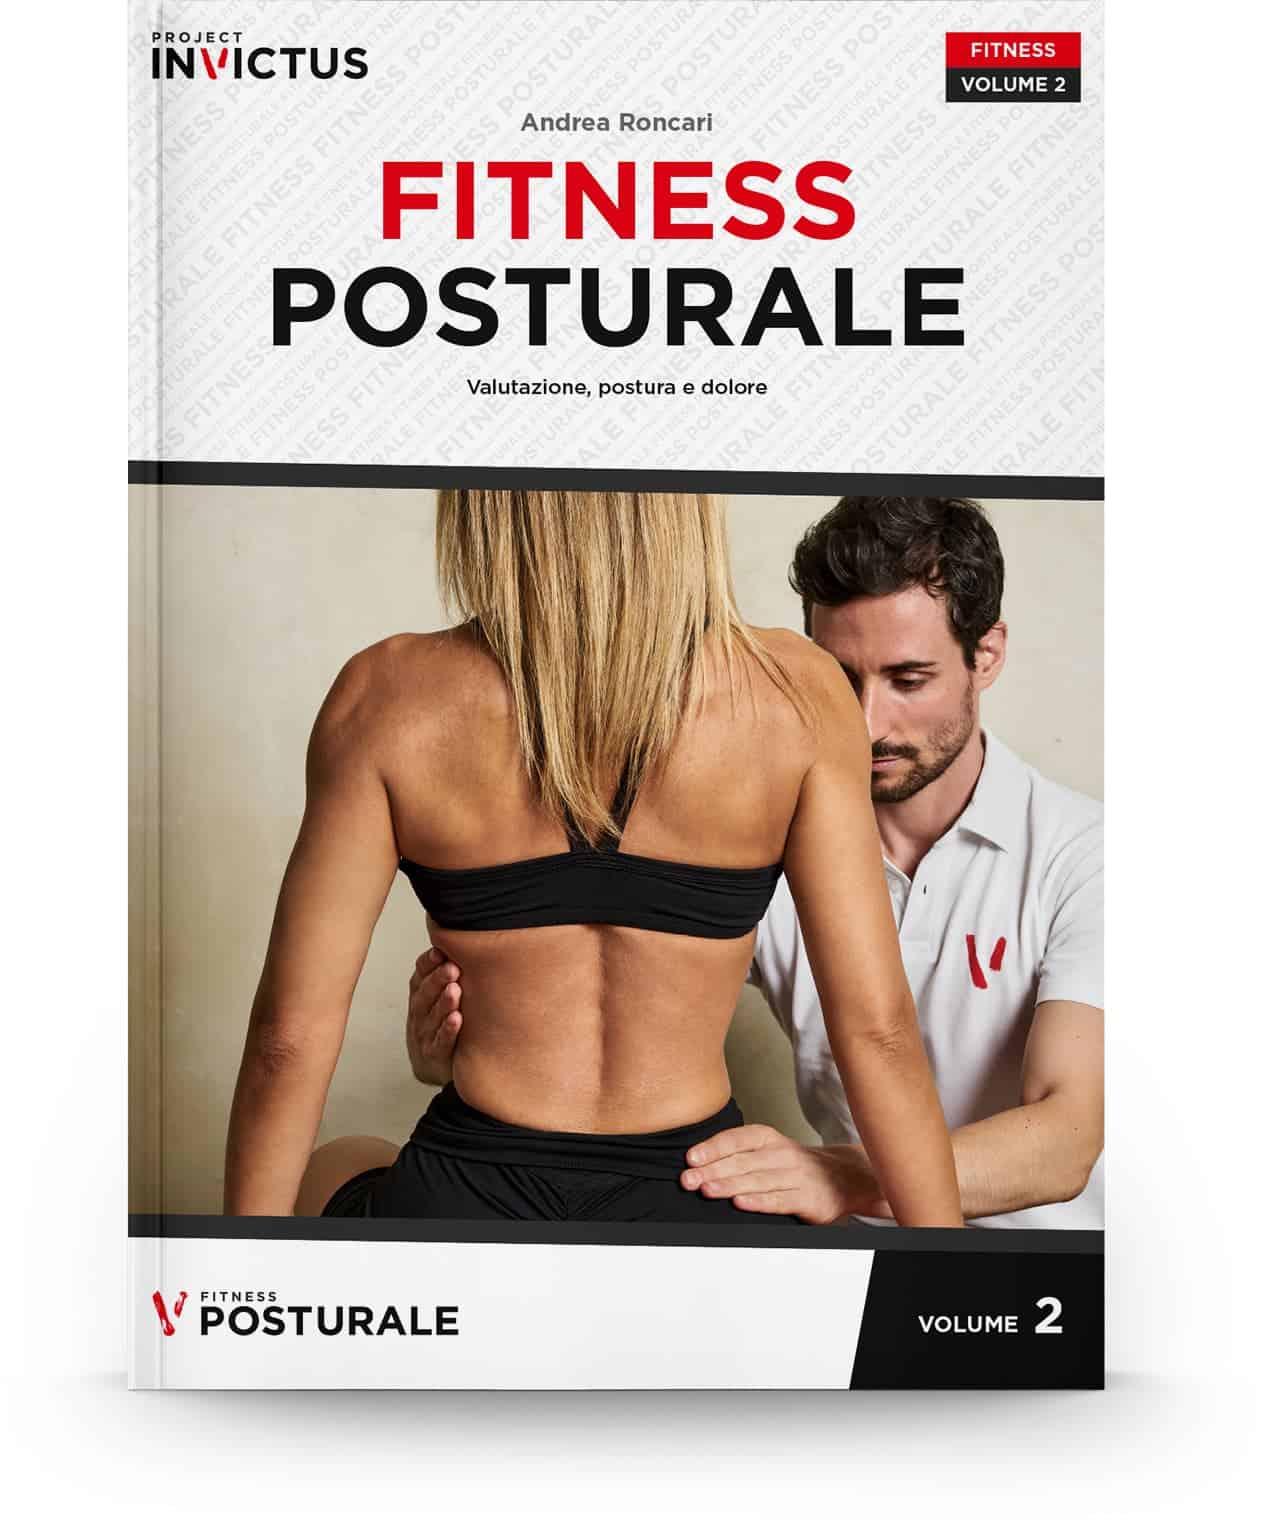 Fitness Posturale Volume 2